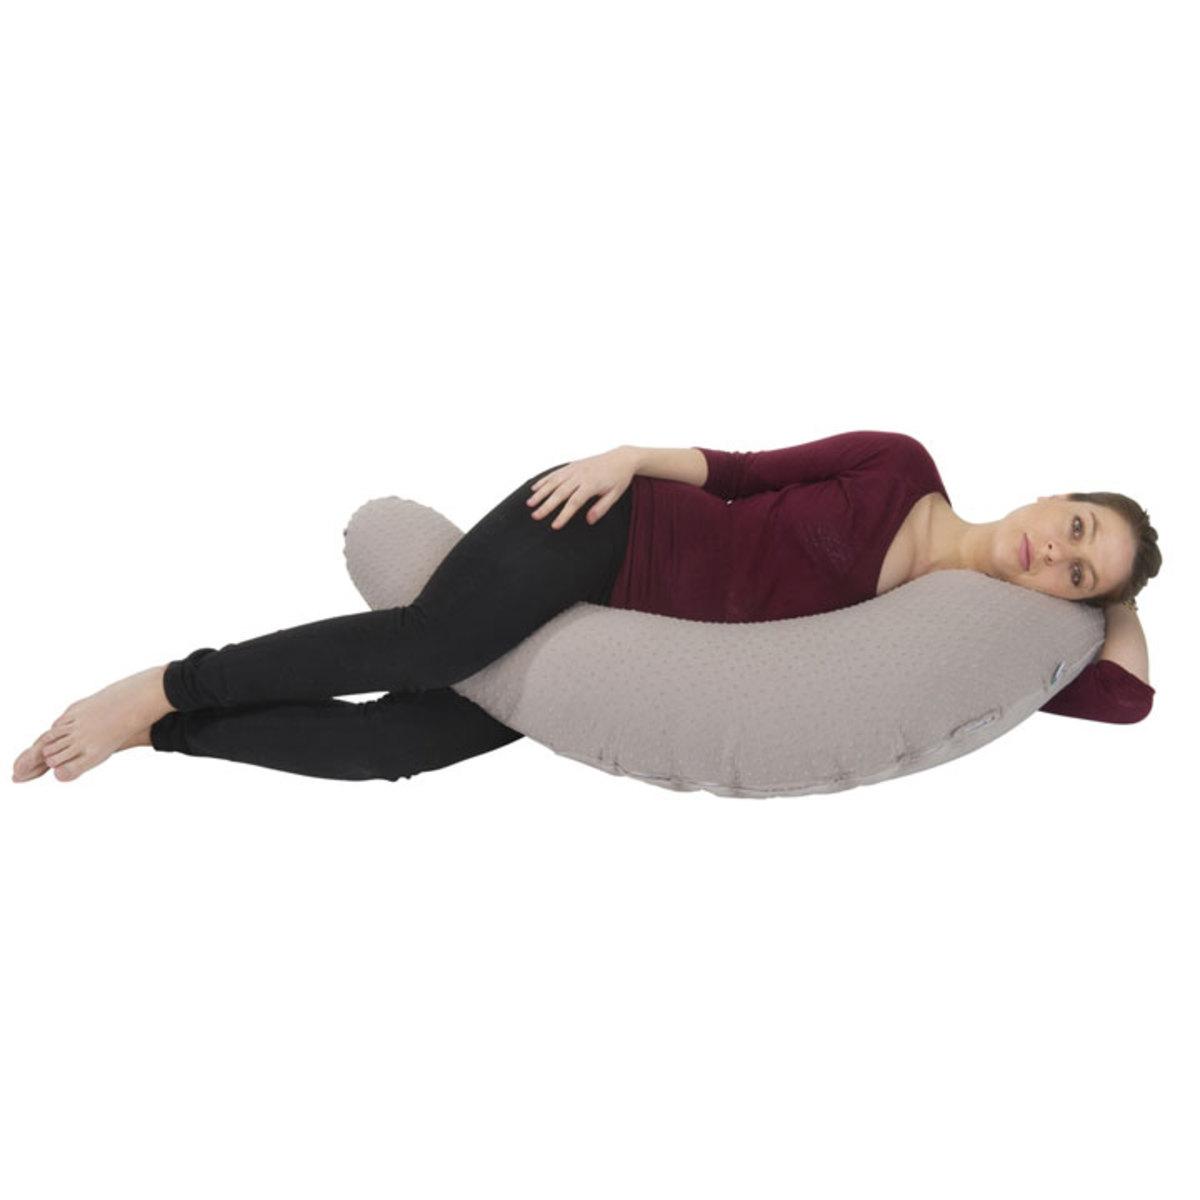 babymoov coussin de maternit plumetis taupe coussin. Black Bedroom Furniture Sets. Home Design Ideas